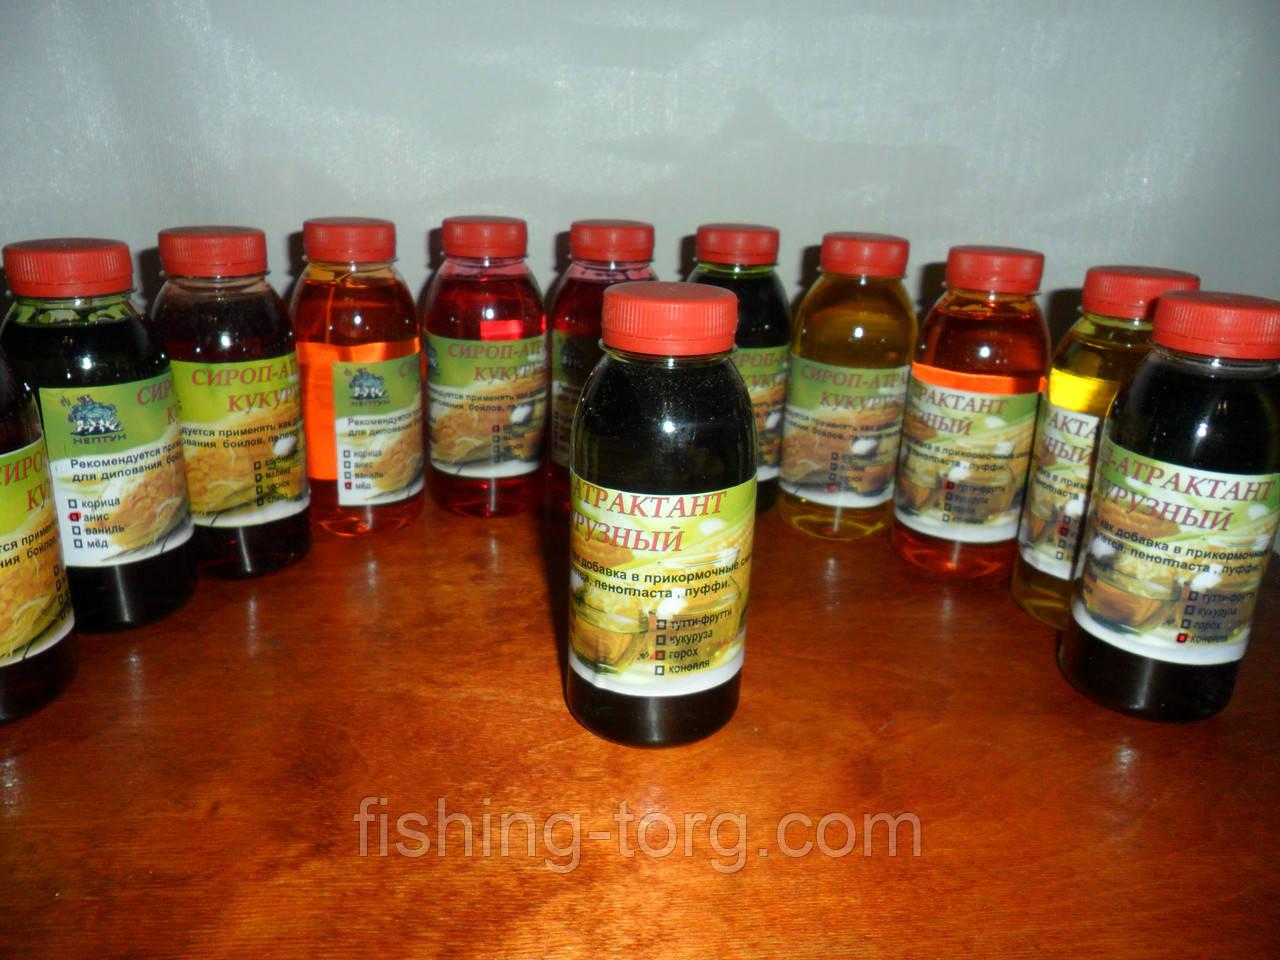 сироп антрактант кукурузный горох  440гр